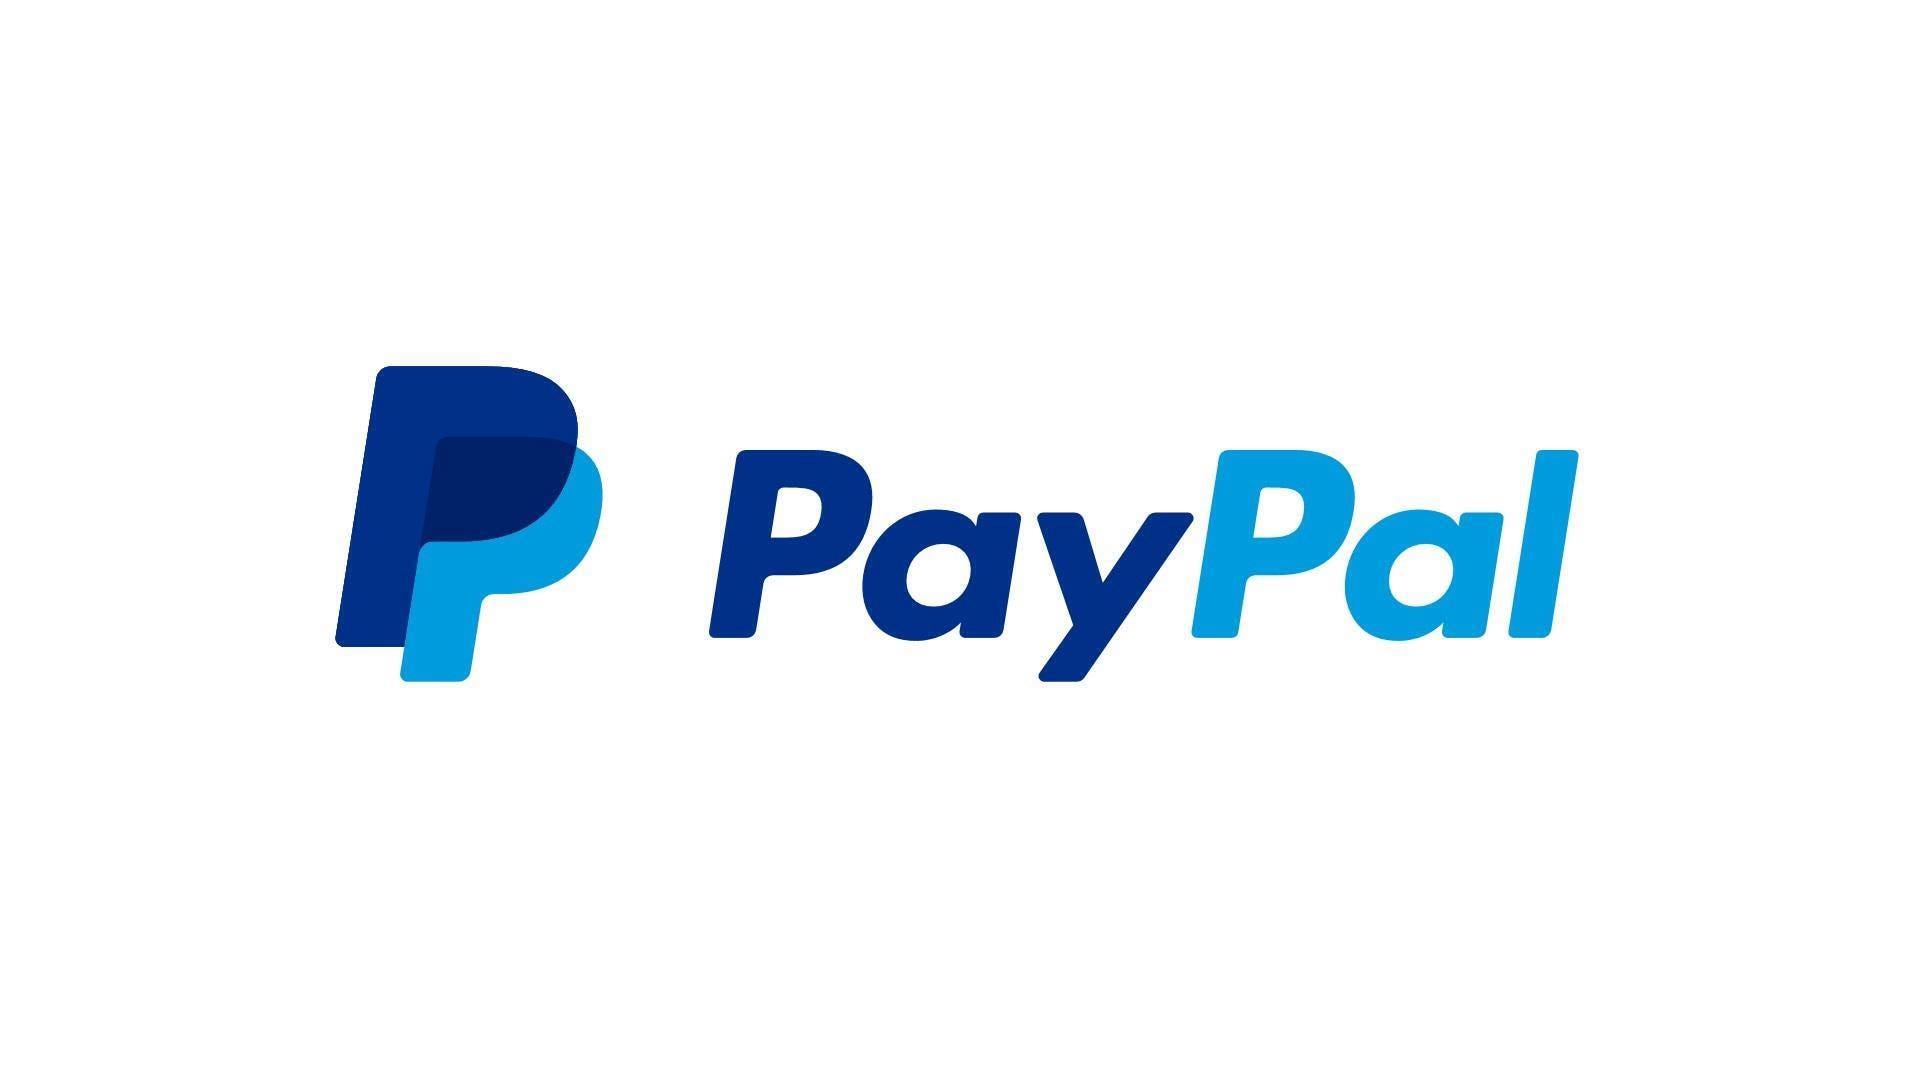 Sigla PayPal